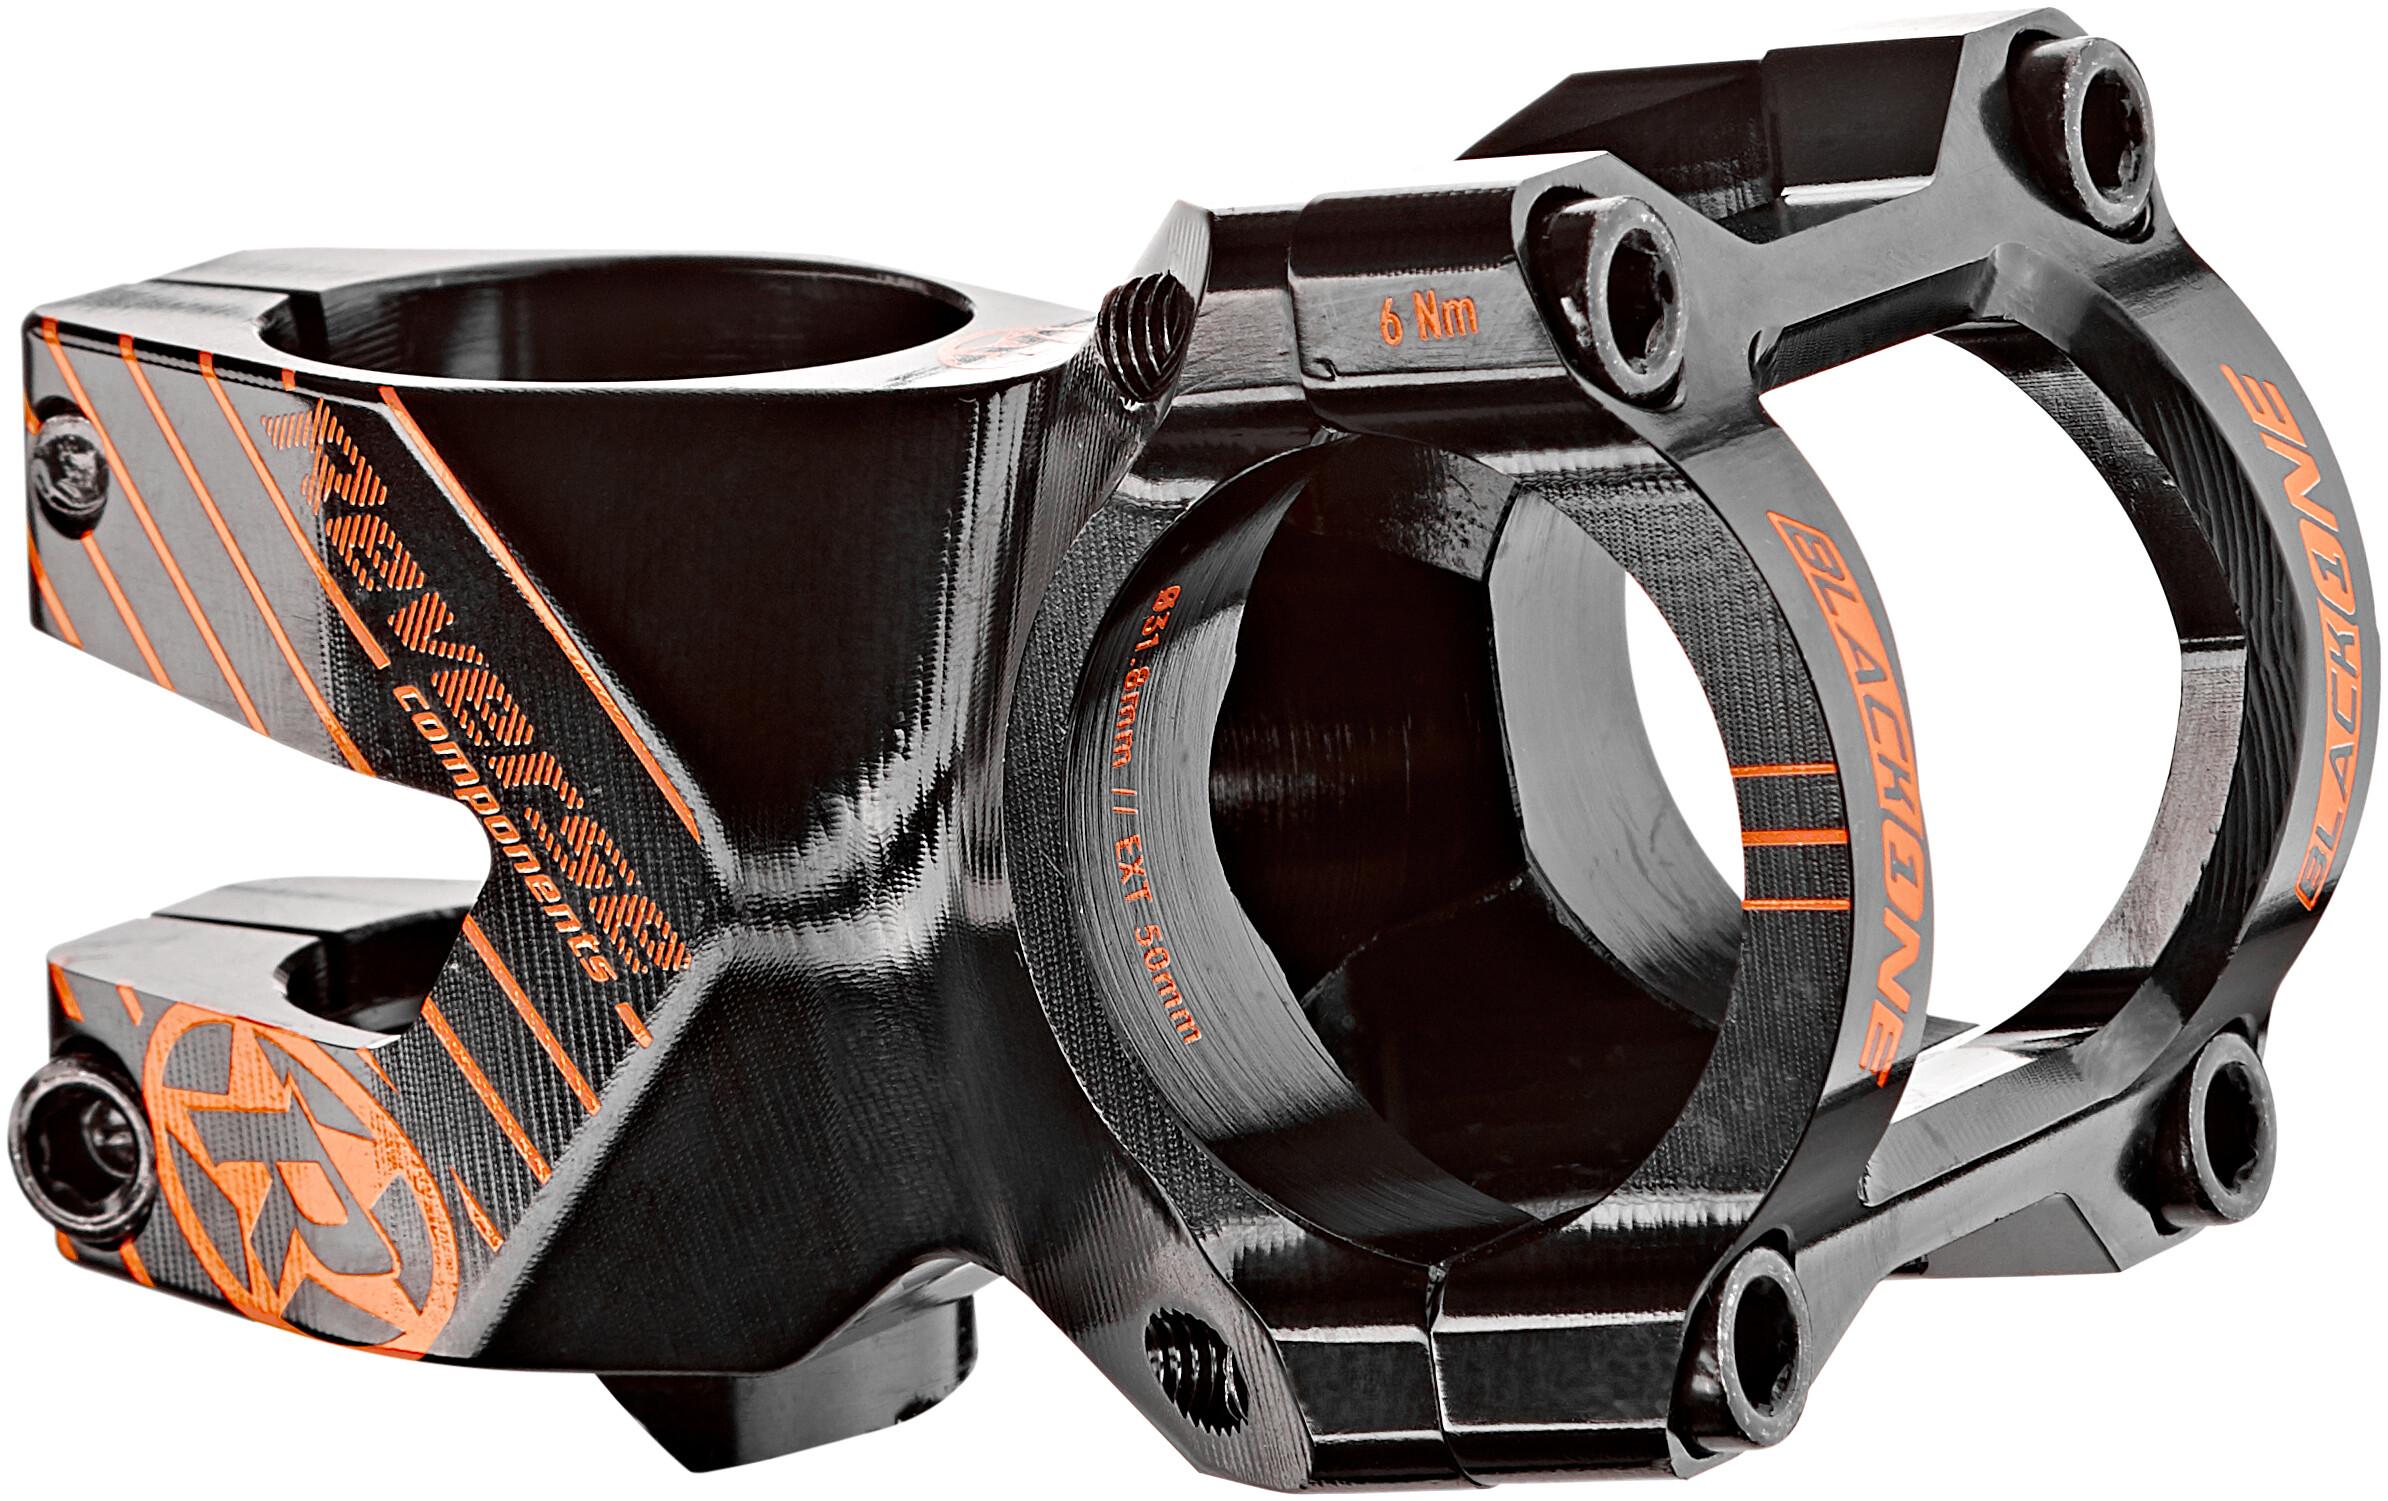 Reverse Black One Enduro potence 31.8 mm 35 mm 8 noir//rouge